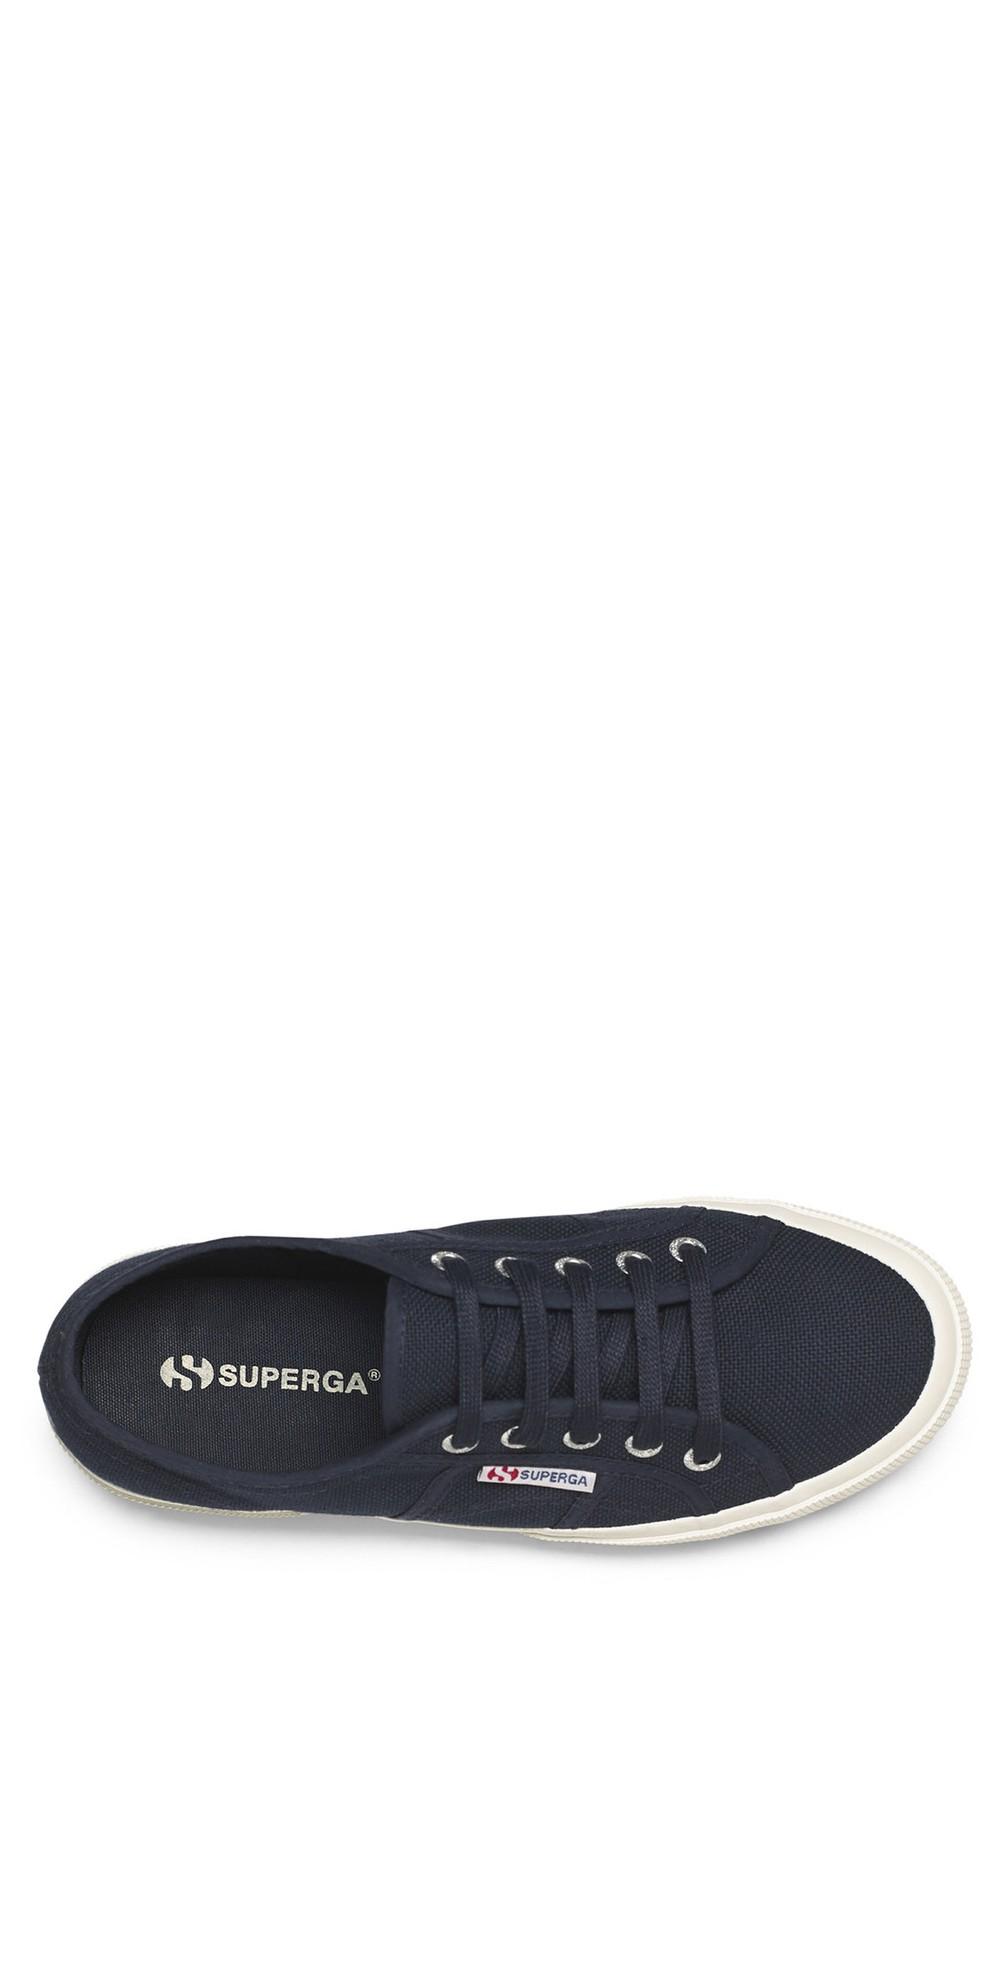 Classic Navy 2750 Cotu Shoe main image